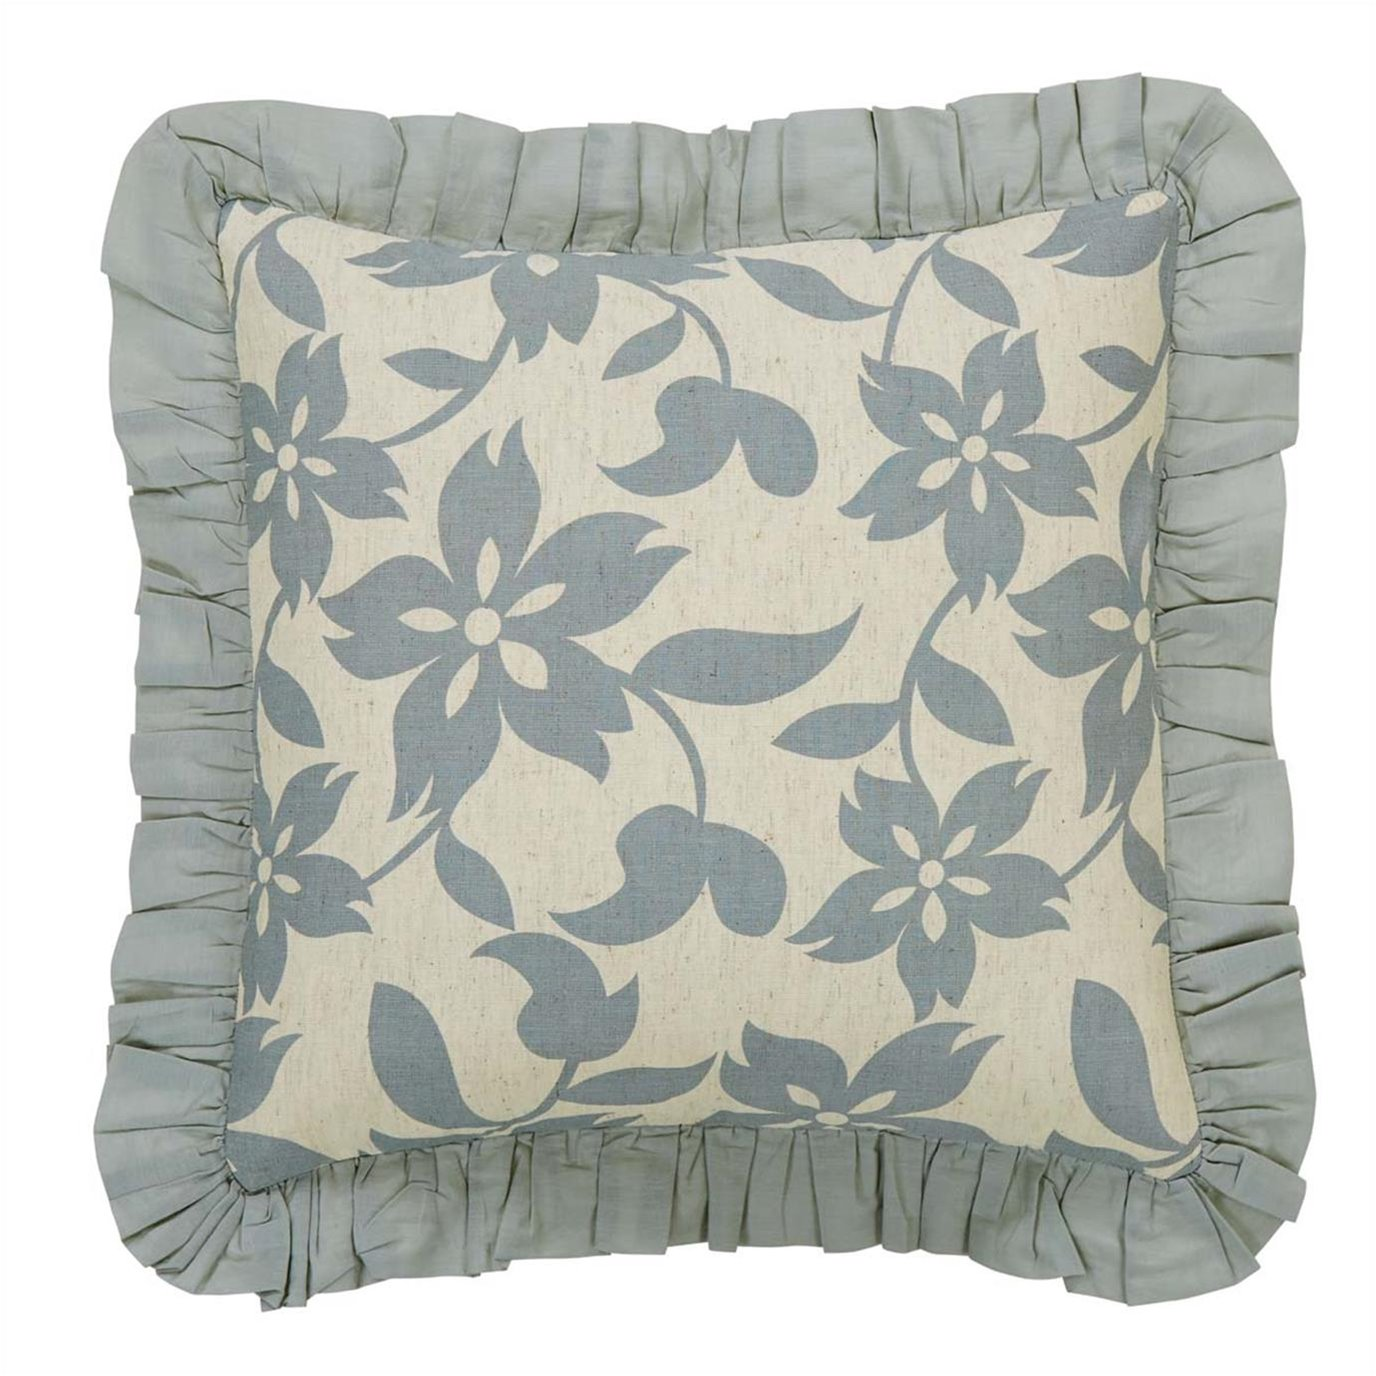 Briar Sage Pillow Cover 18x18